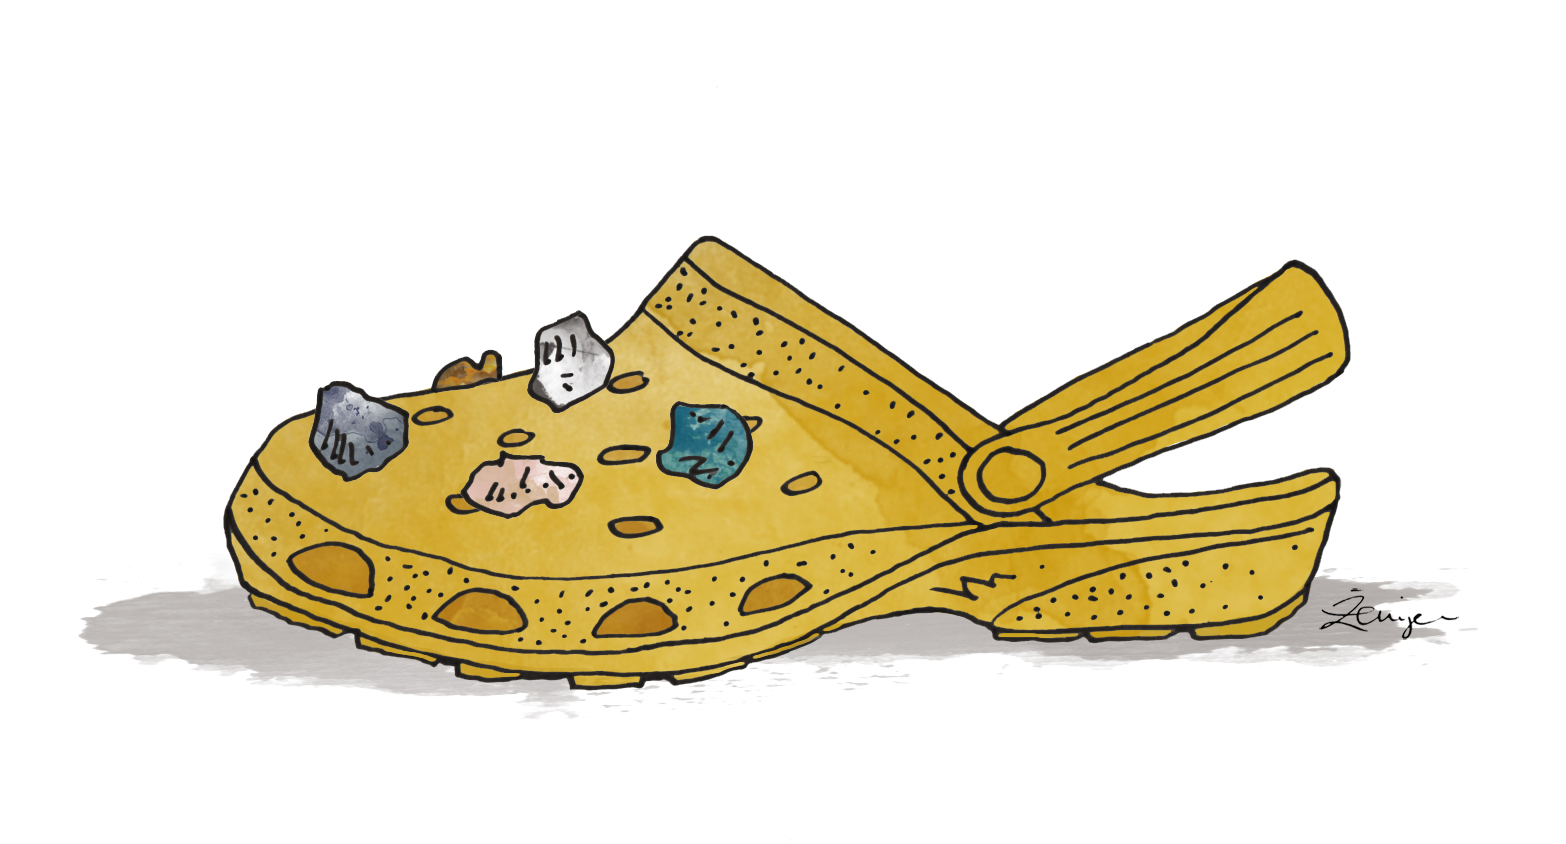 croc-a-doodle-eww.jpg